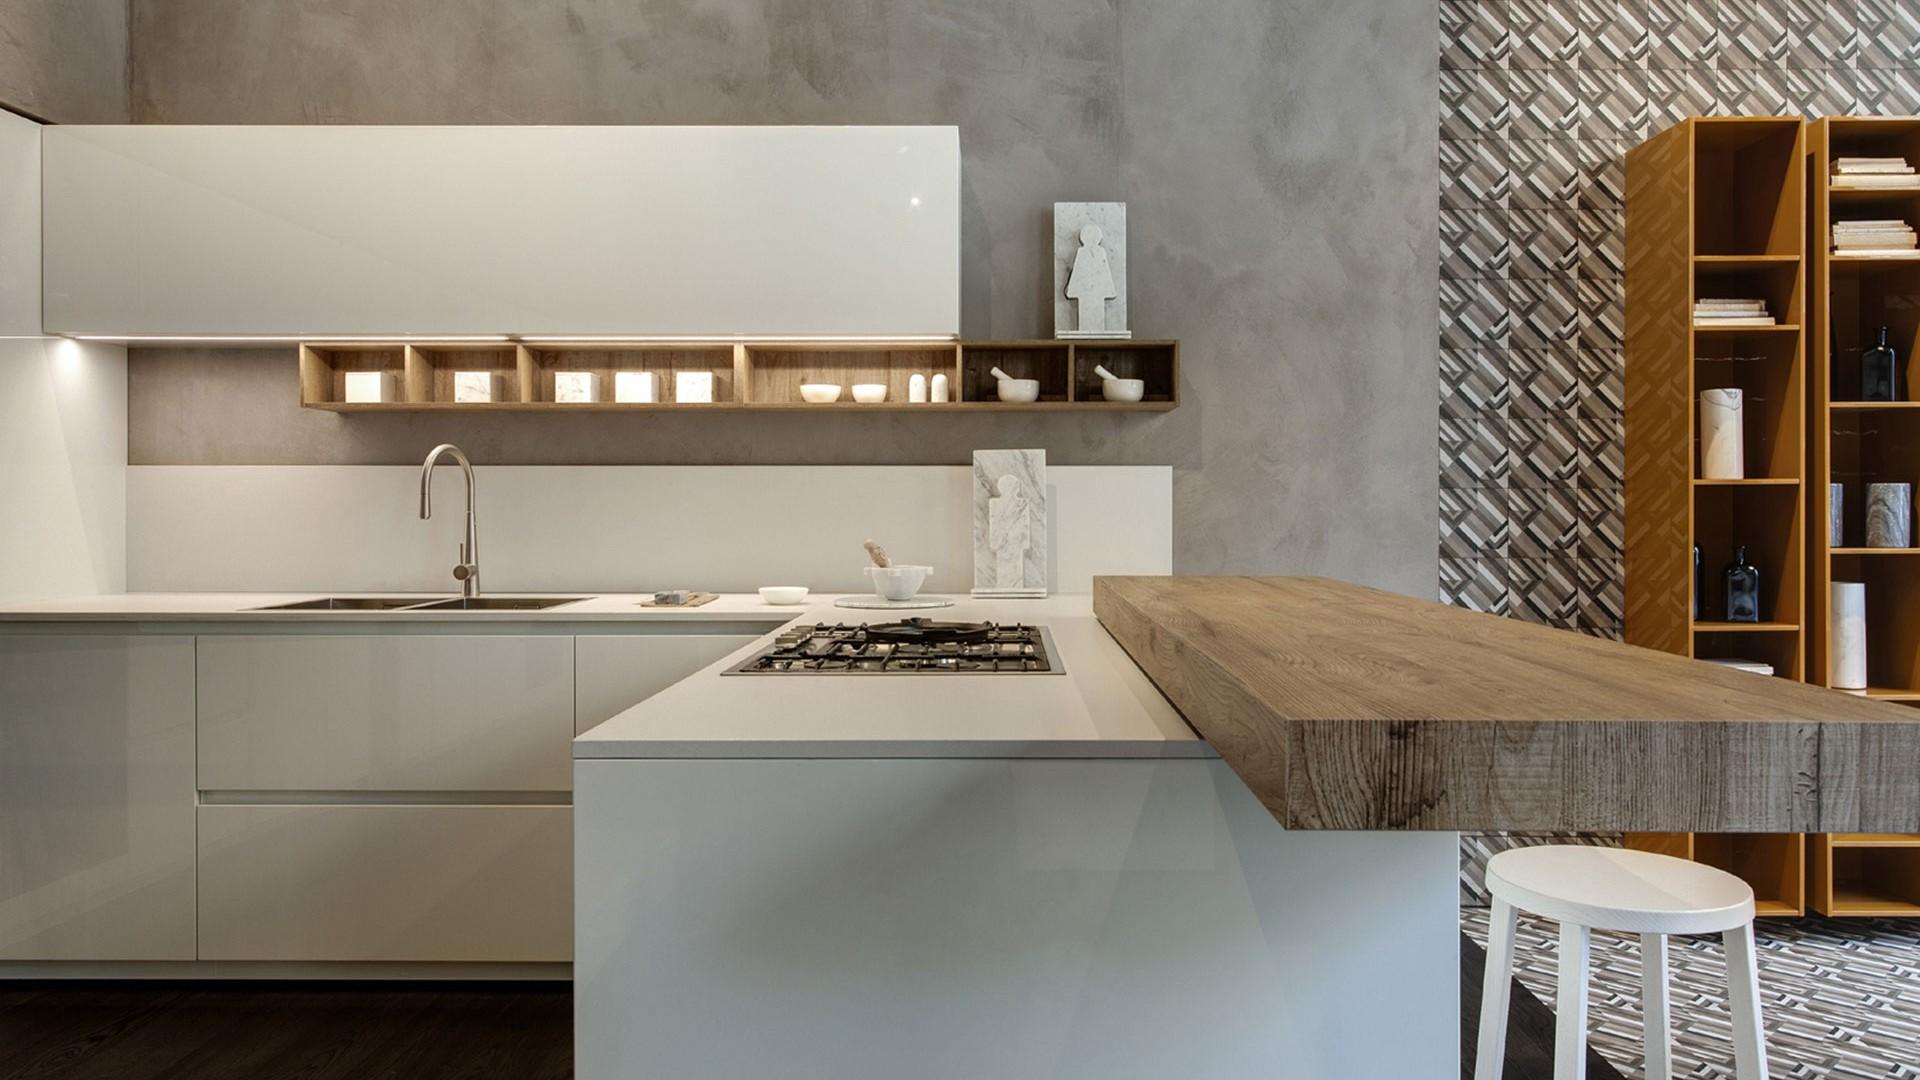 Outlet arredo design arredo bagno design arredamento for Outlet online arredamento